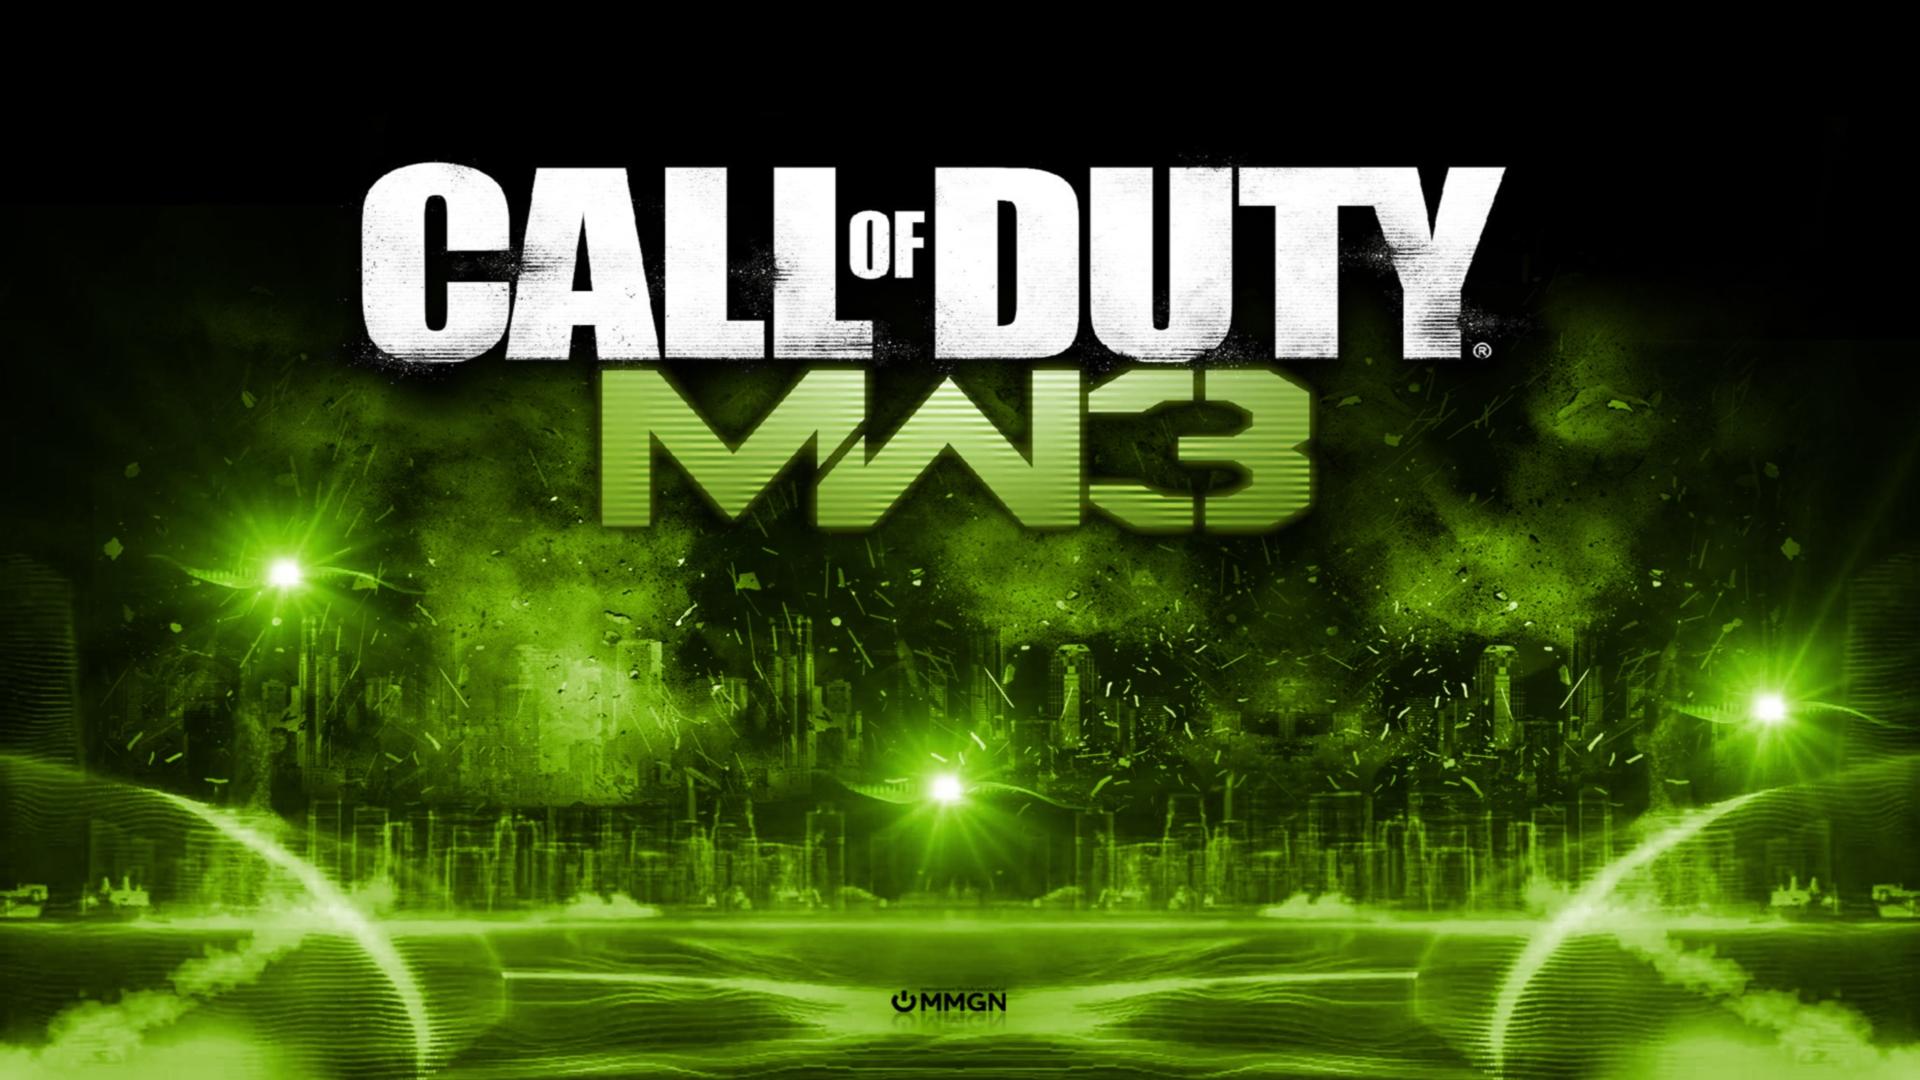 Call Of Duty Modern Warfare 3 Hd Wallpaper Background Image